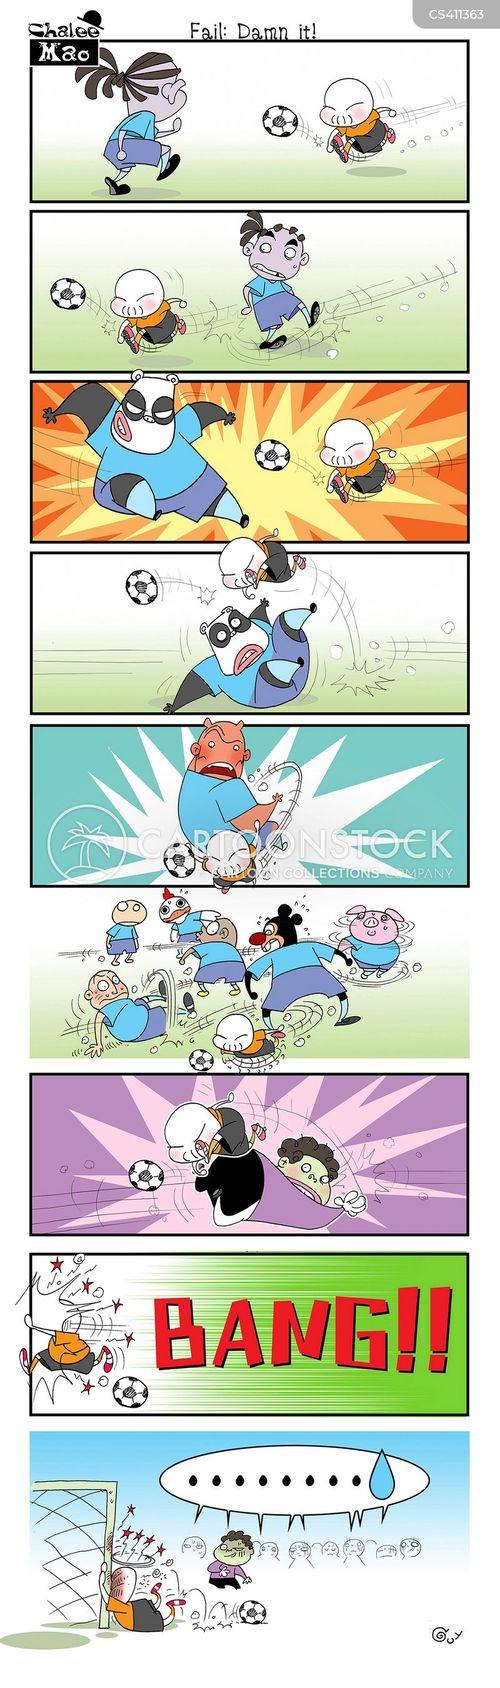 football tournaments cartoon